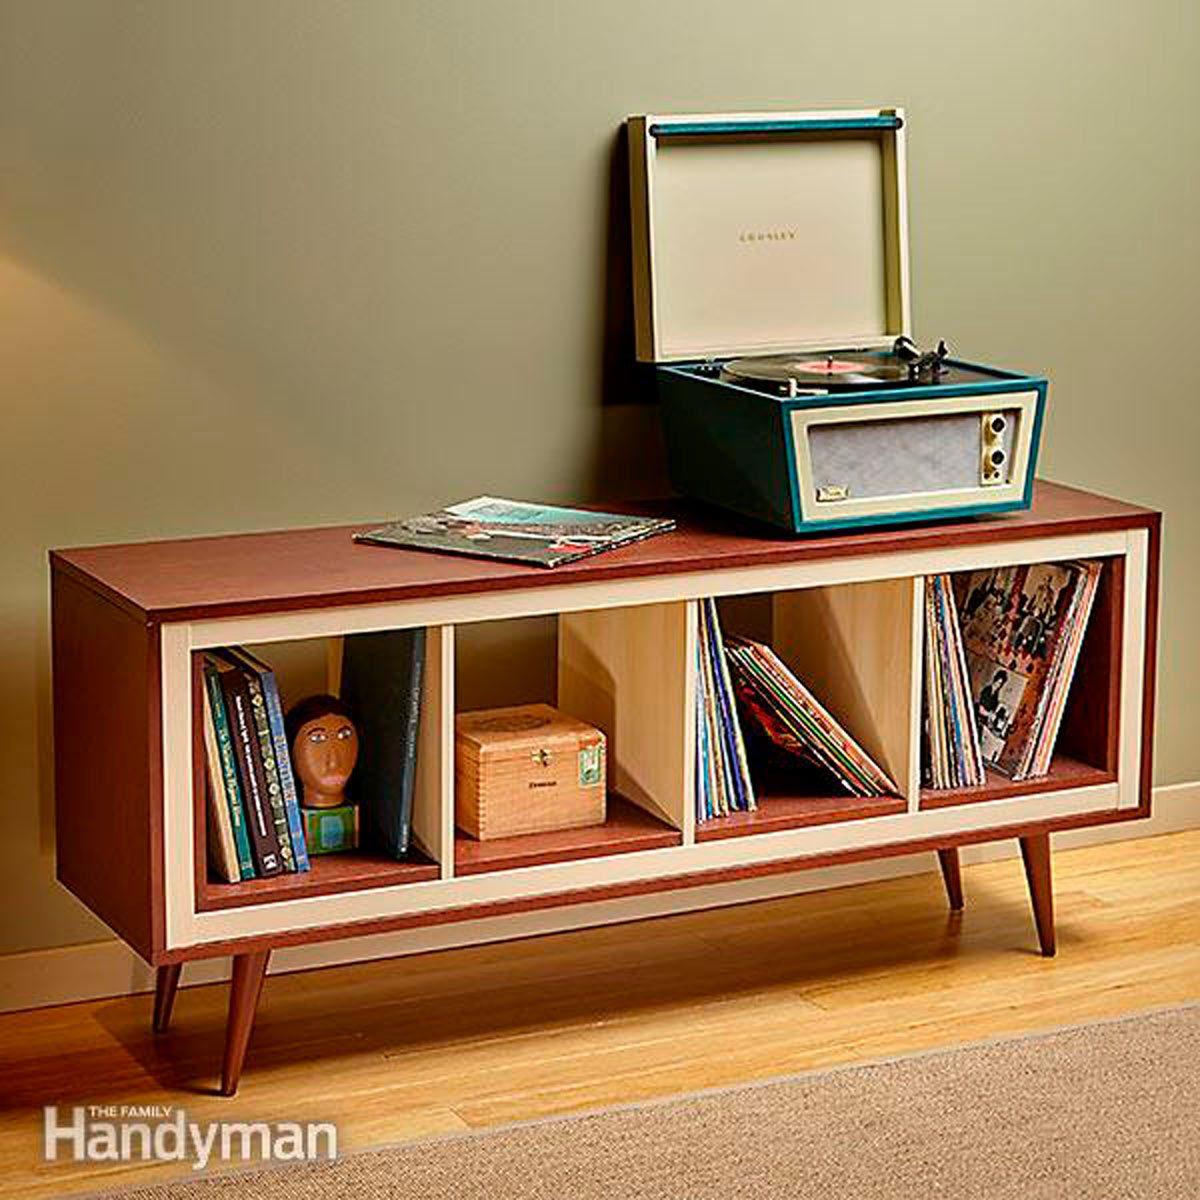 12 Best Looking Refurbished Bookshelves Family Handyman